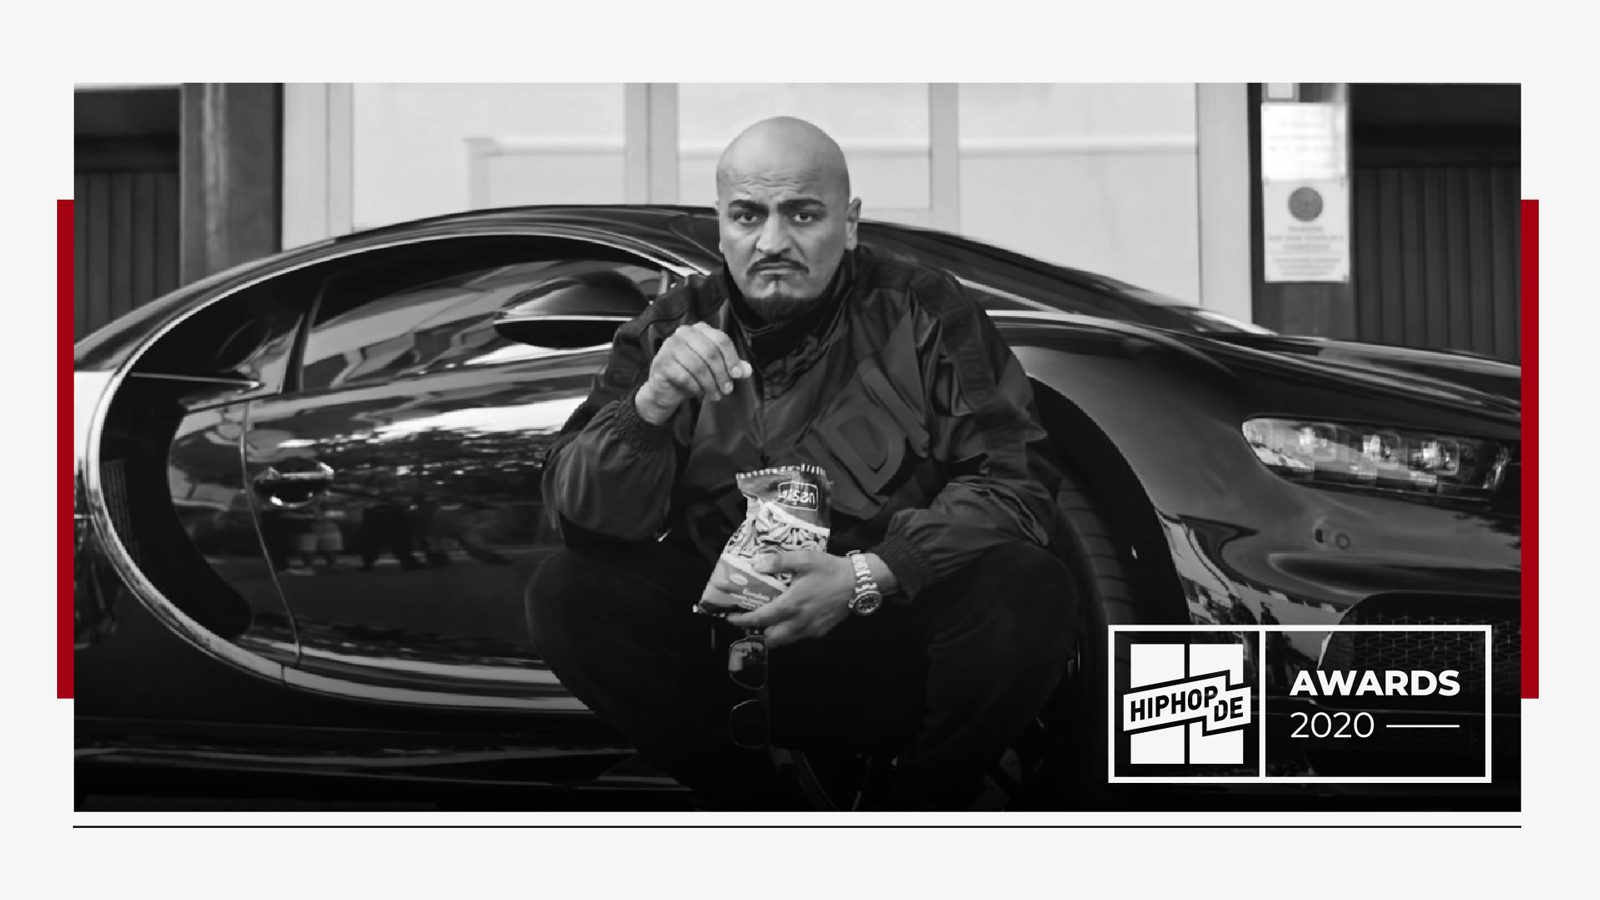 XATAR macht Moves bis er selbst ein Major Label ist – Hiphop.de Awards 2020